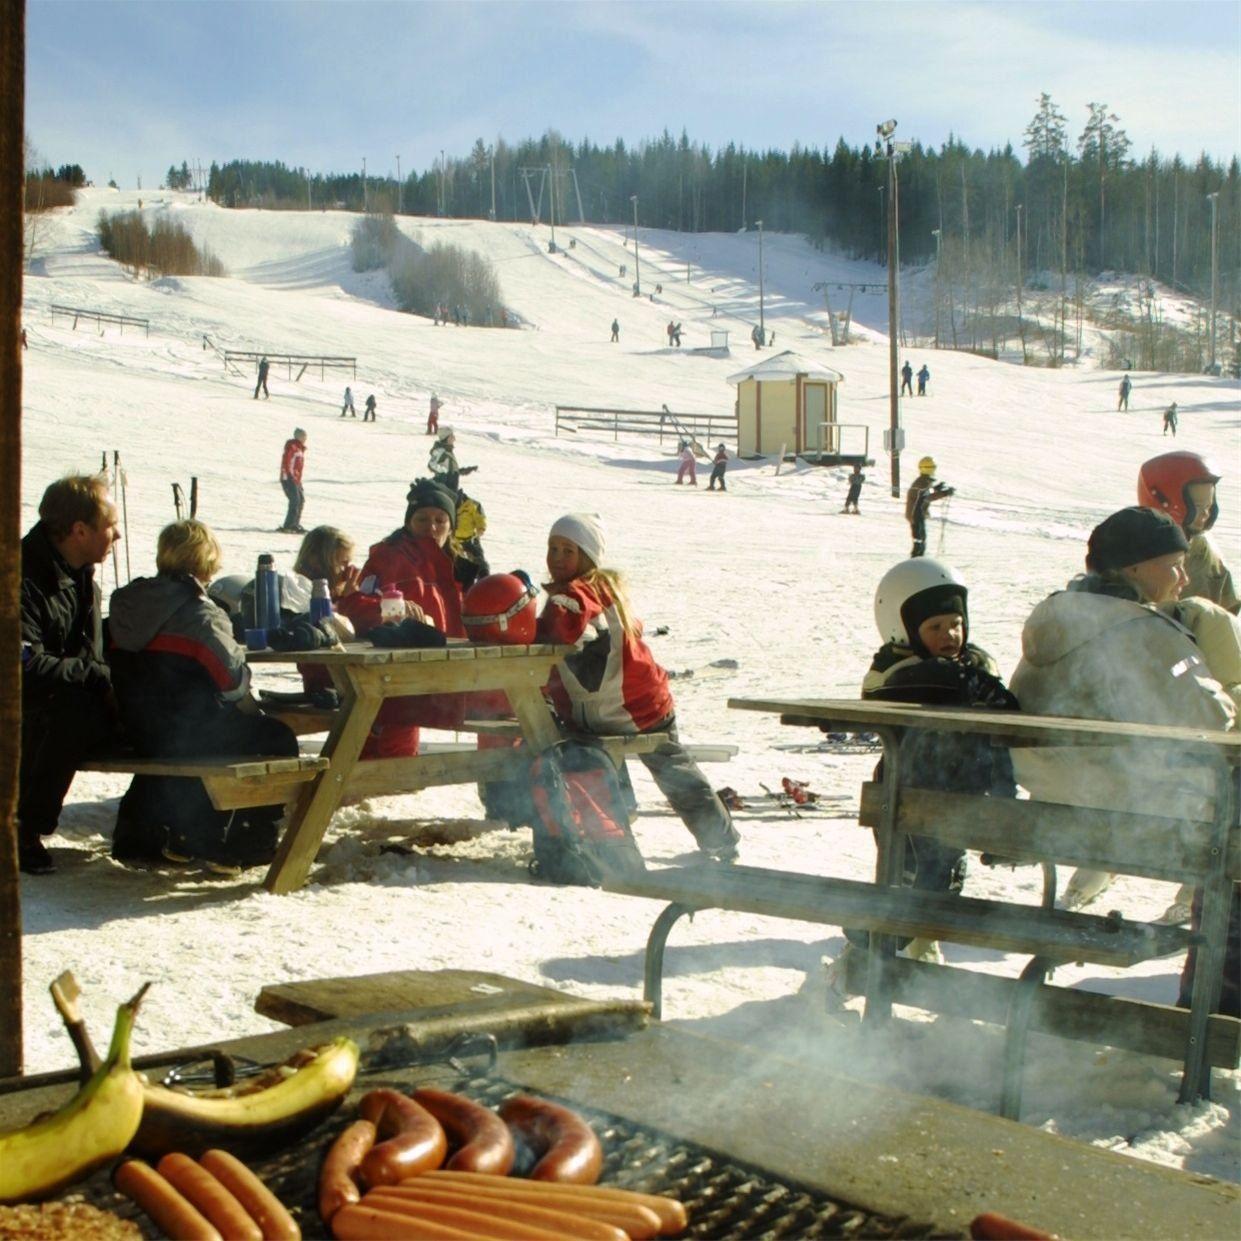 Granberget - Leksand Ski